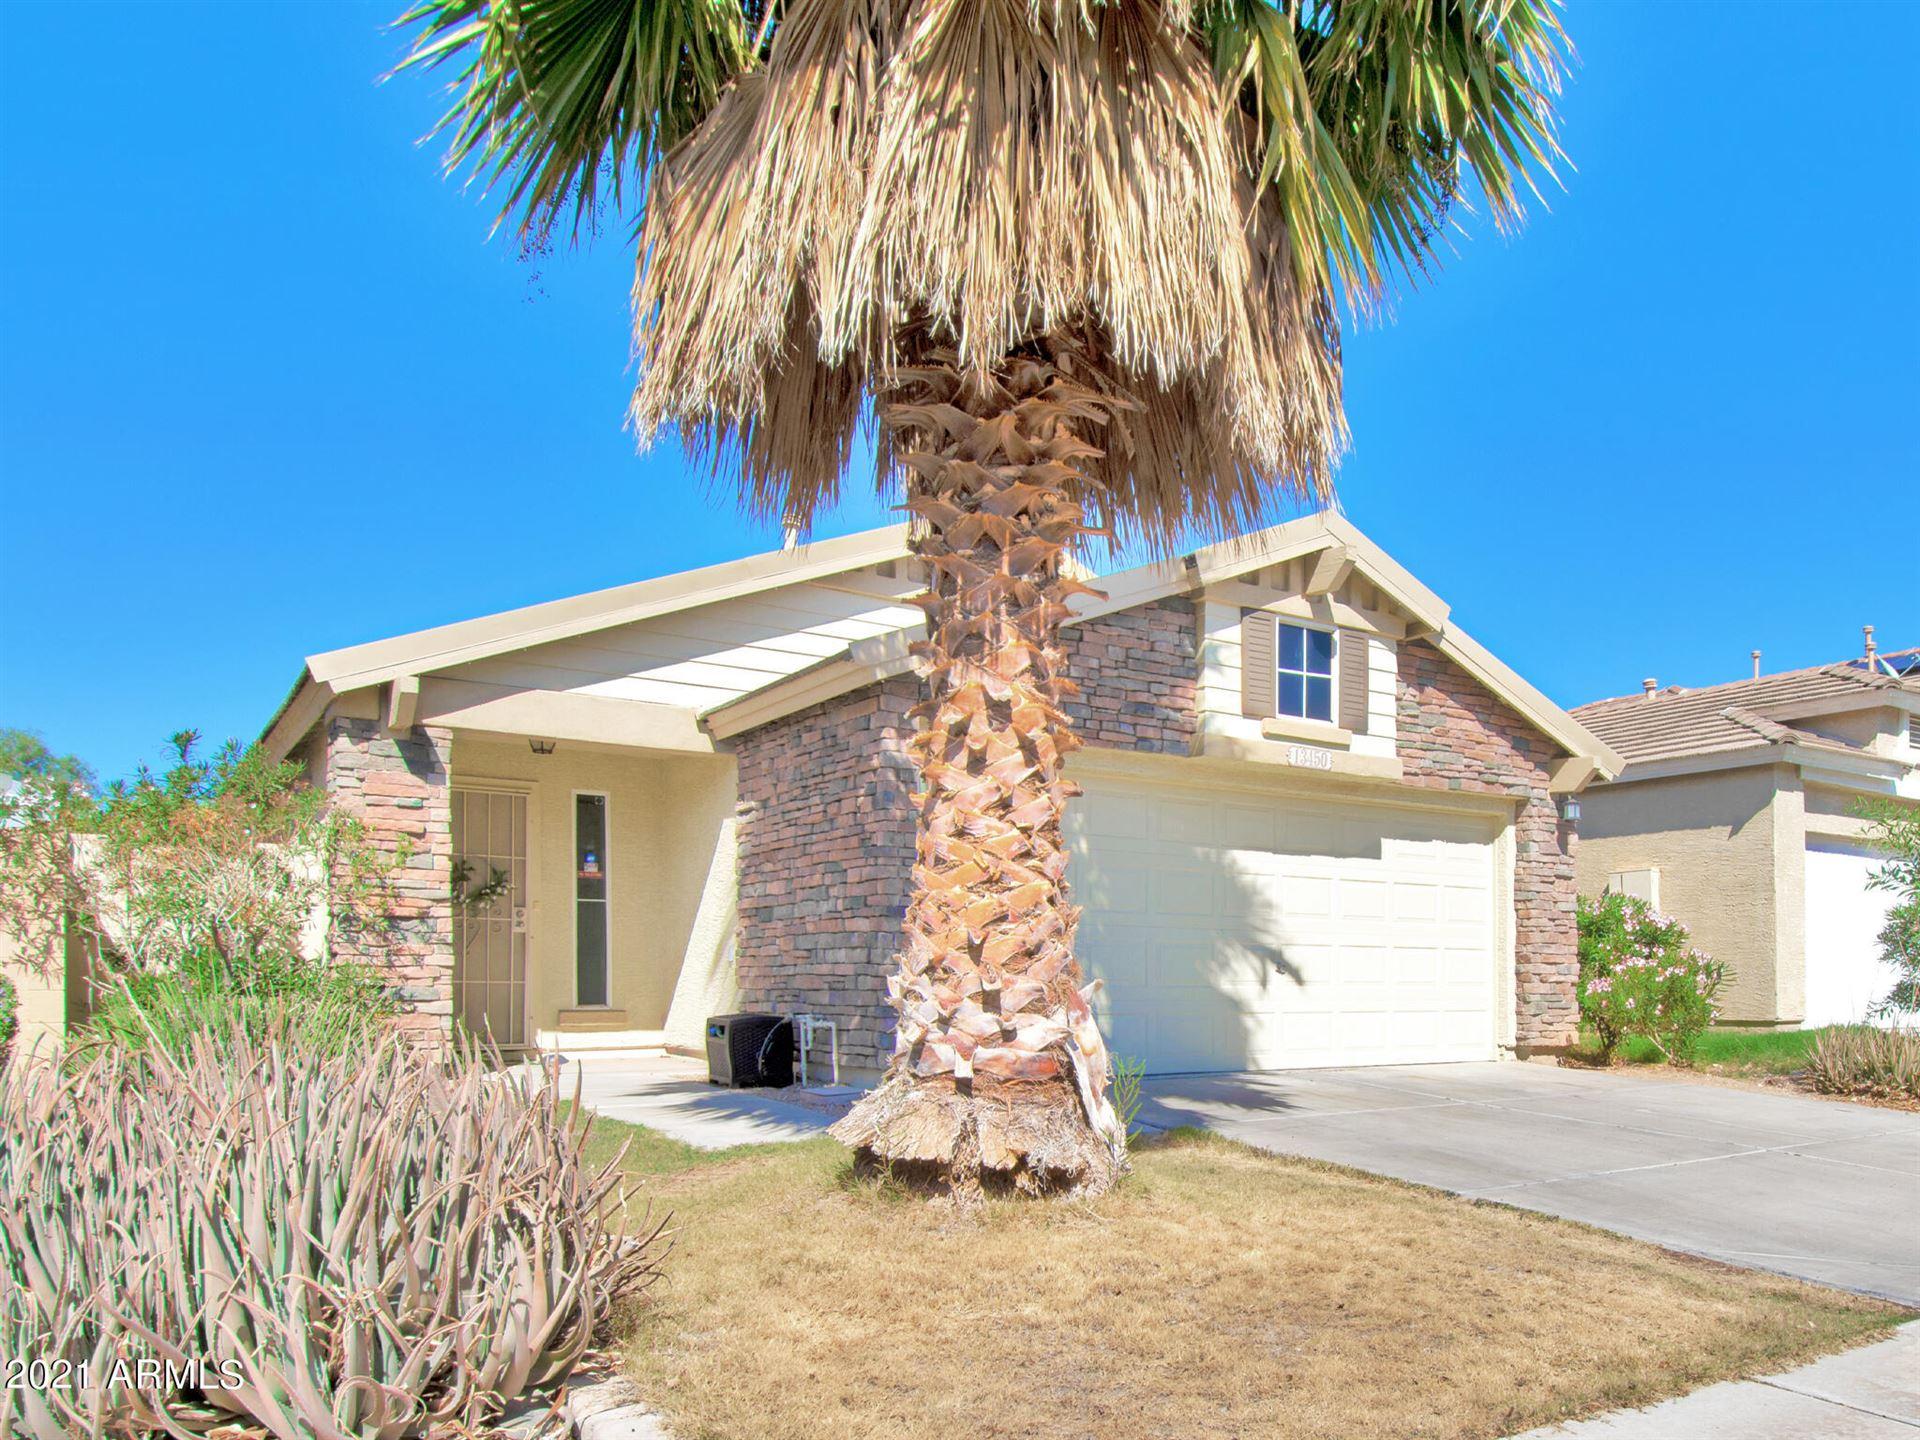 Photo of 13450 W ROVEY Avenue, Litchfield Park, AZ 85340 (MLS # 6307531)